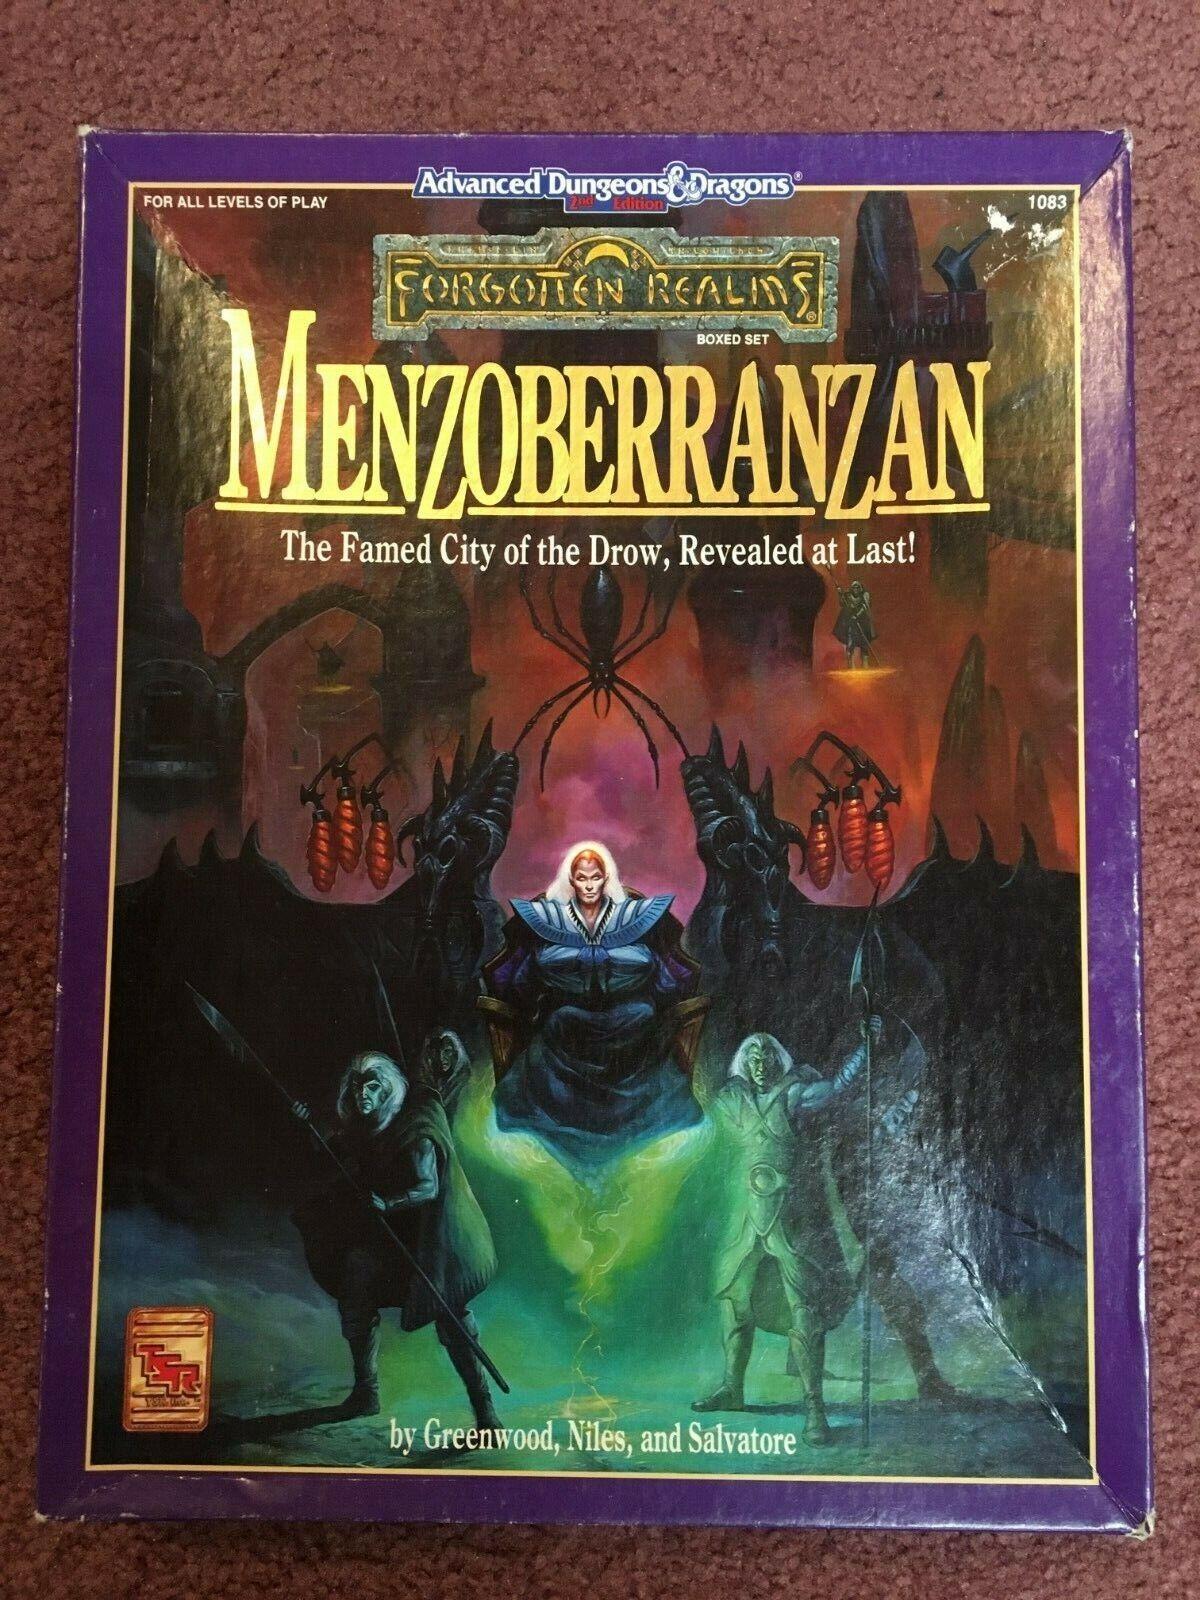 AD&D 2nd Edition 2E Menzoberranzan Box Set Complete Dungeons & Dragons VF+